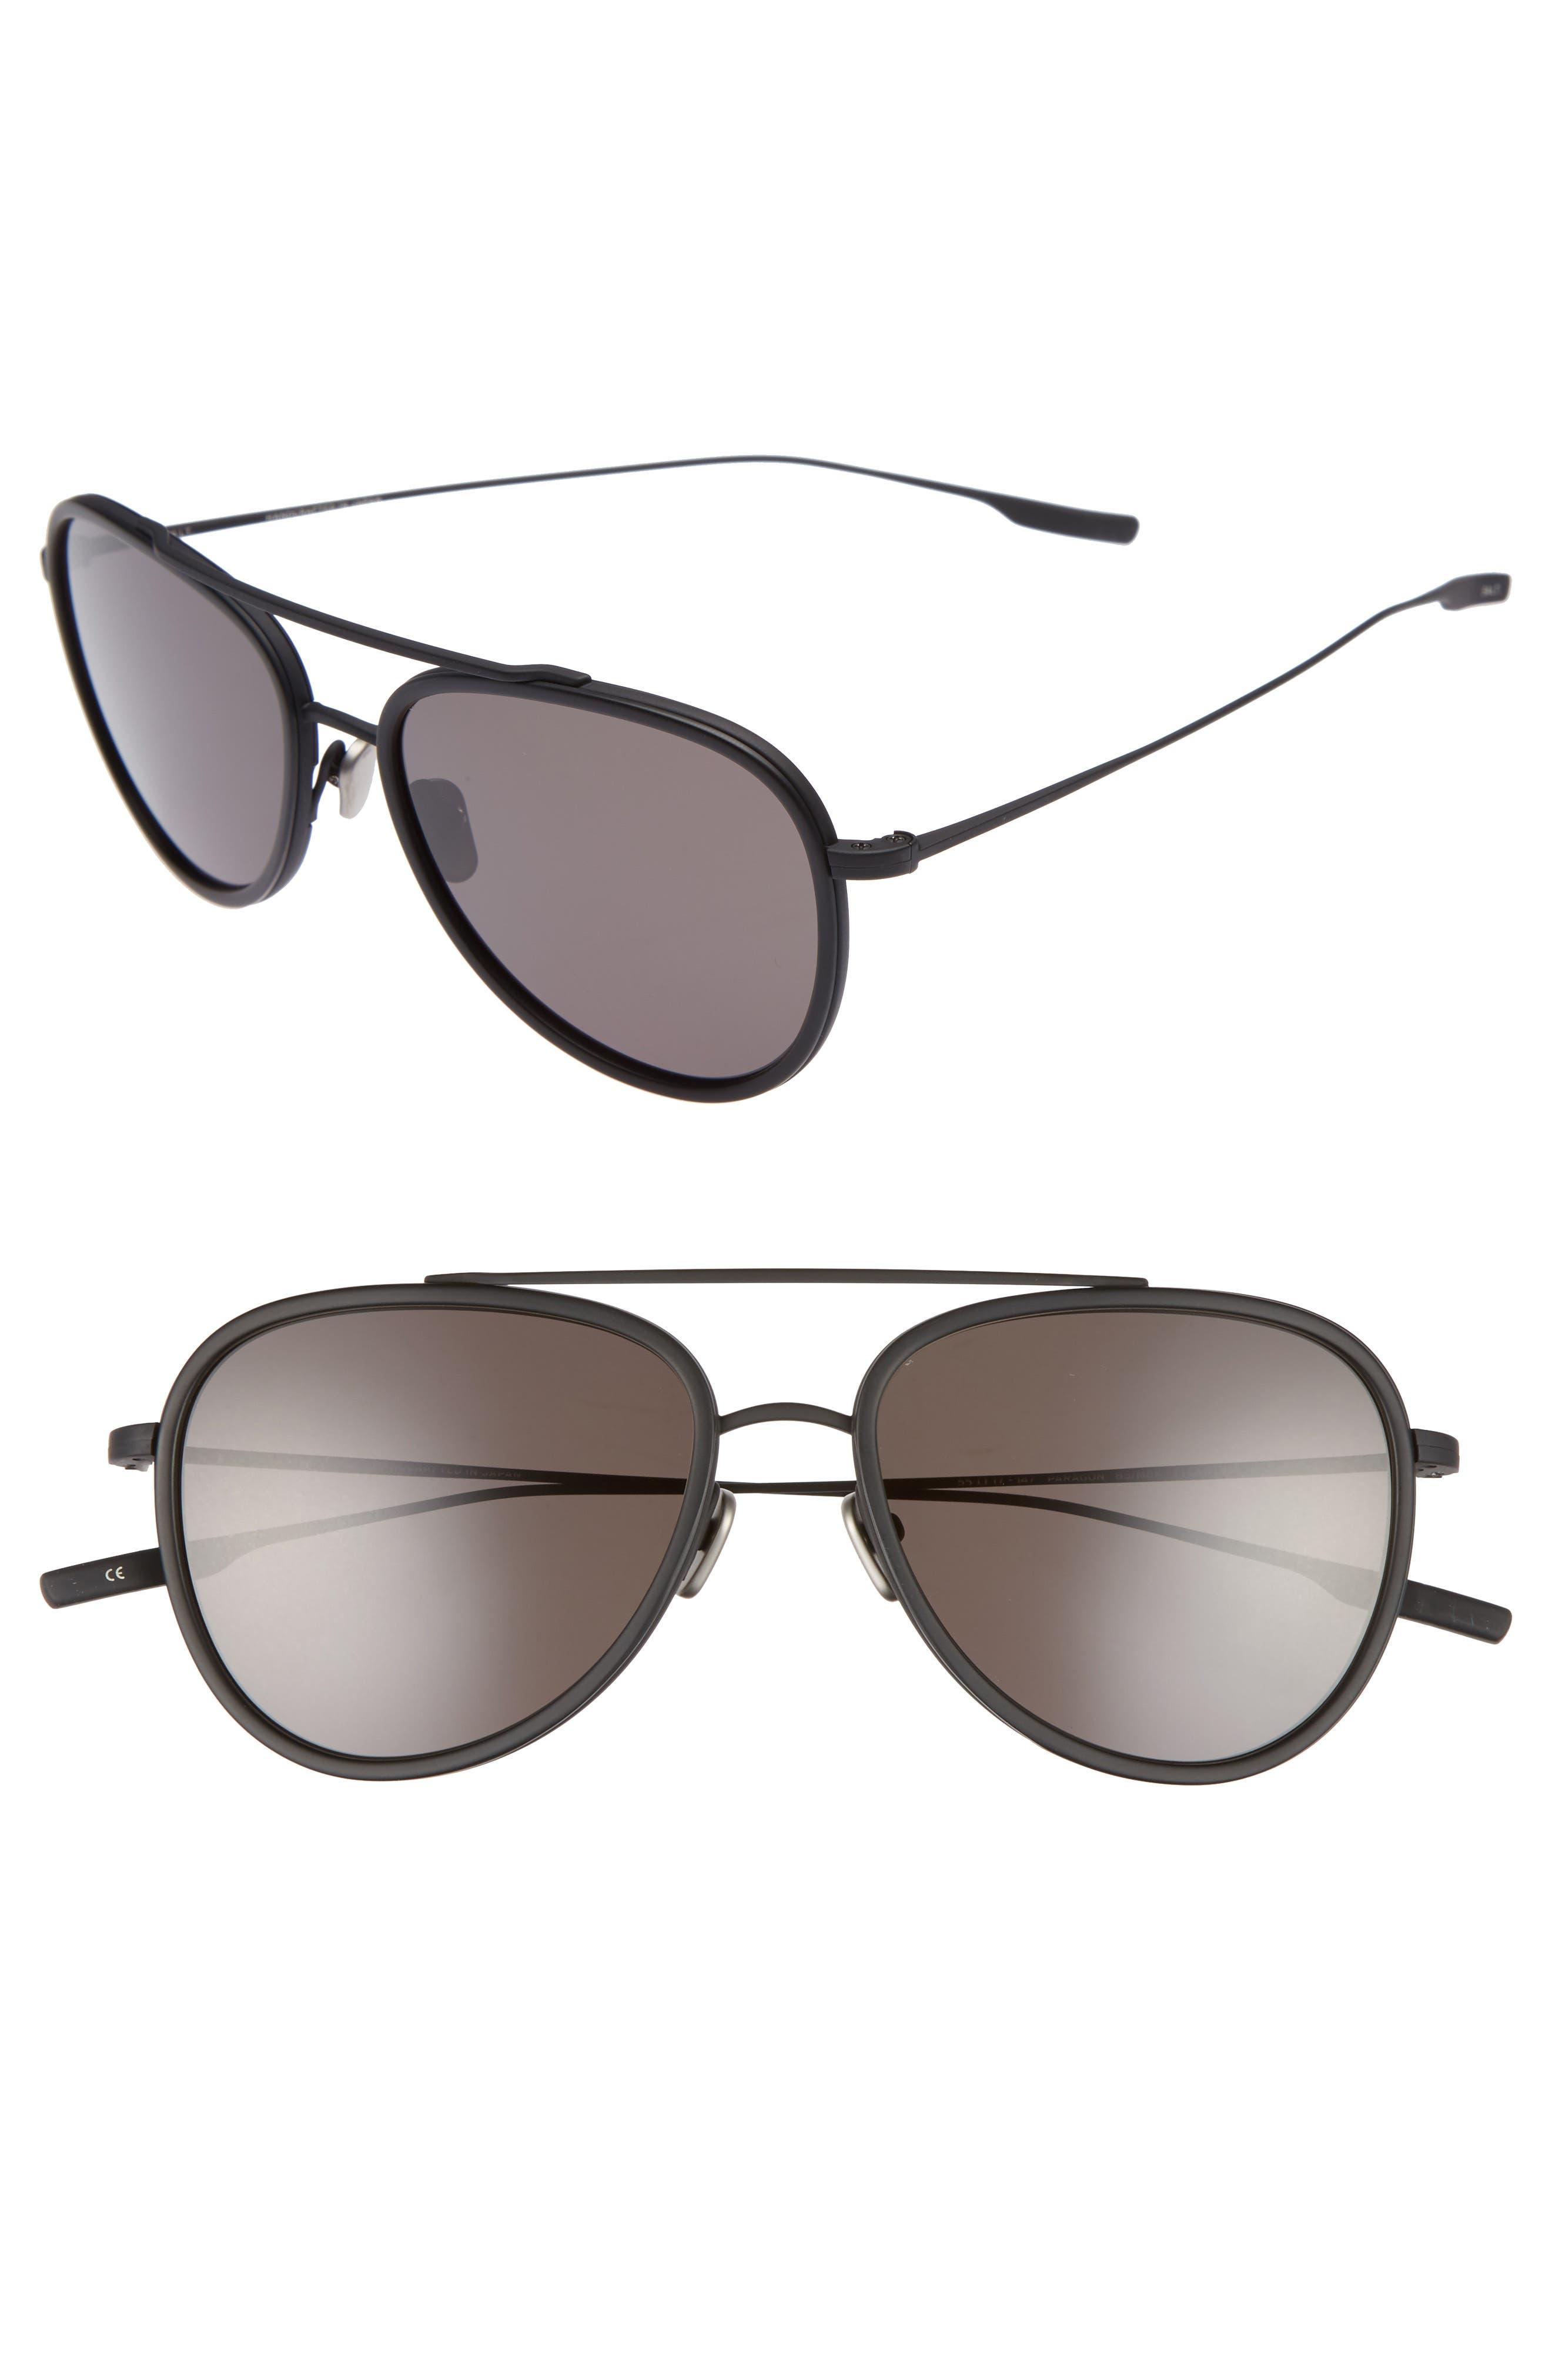 Paragon 55mm Polarized Aviator Sunglasses,                             Main thumbnail 1, color,                             010